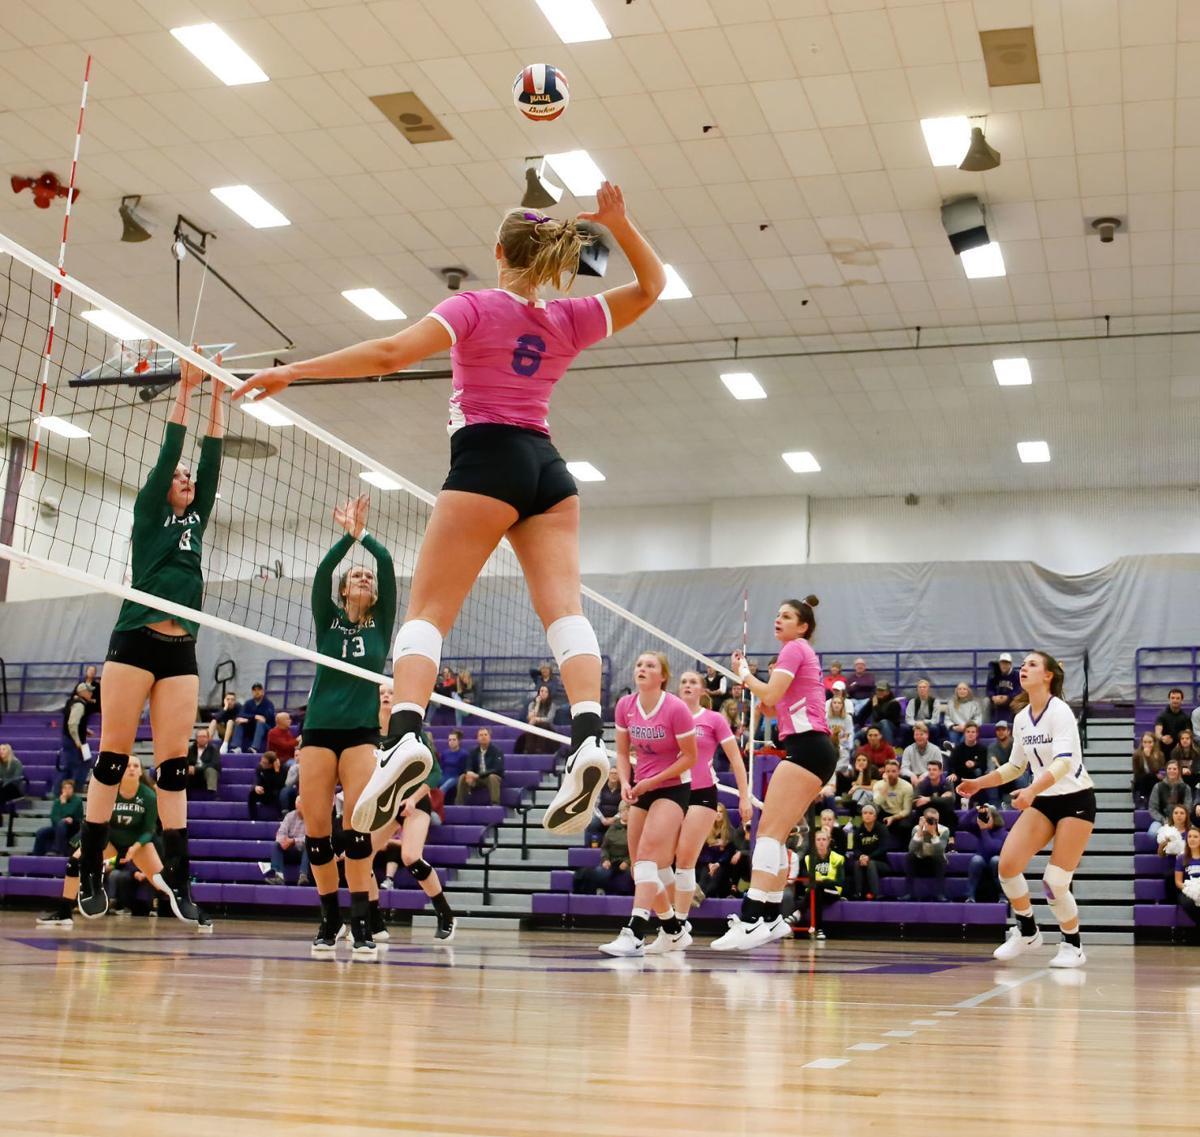 110619-ir-spt-volleyball-CC-4.jpg